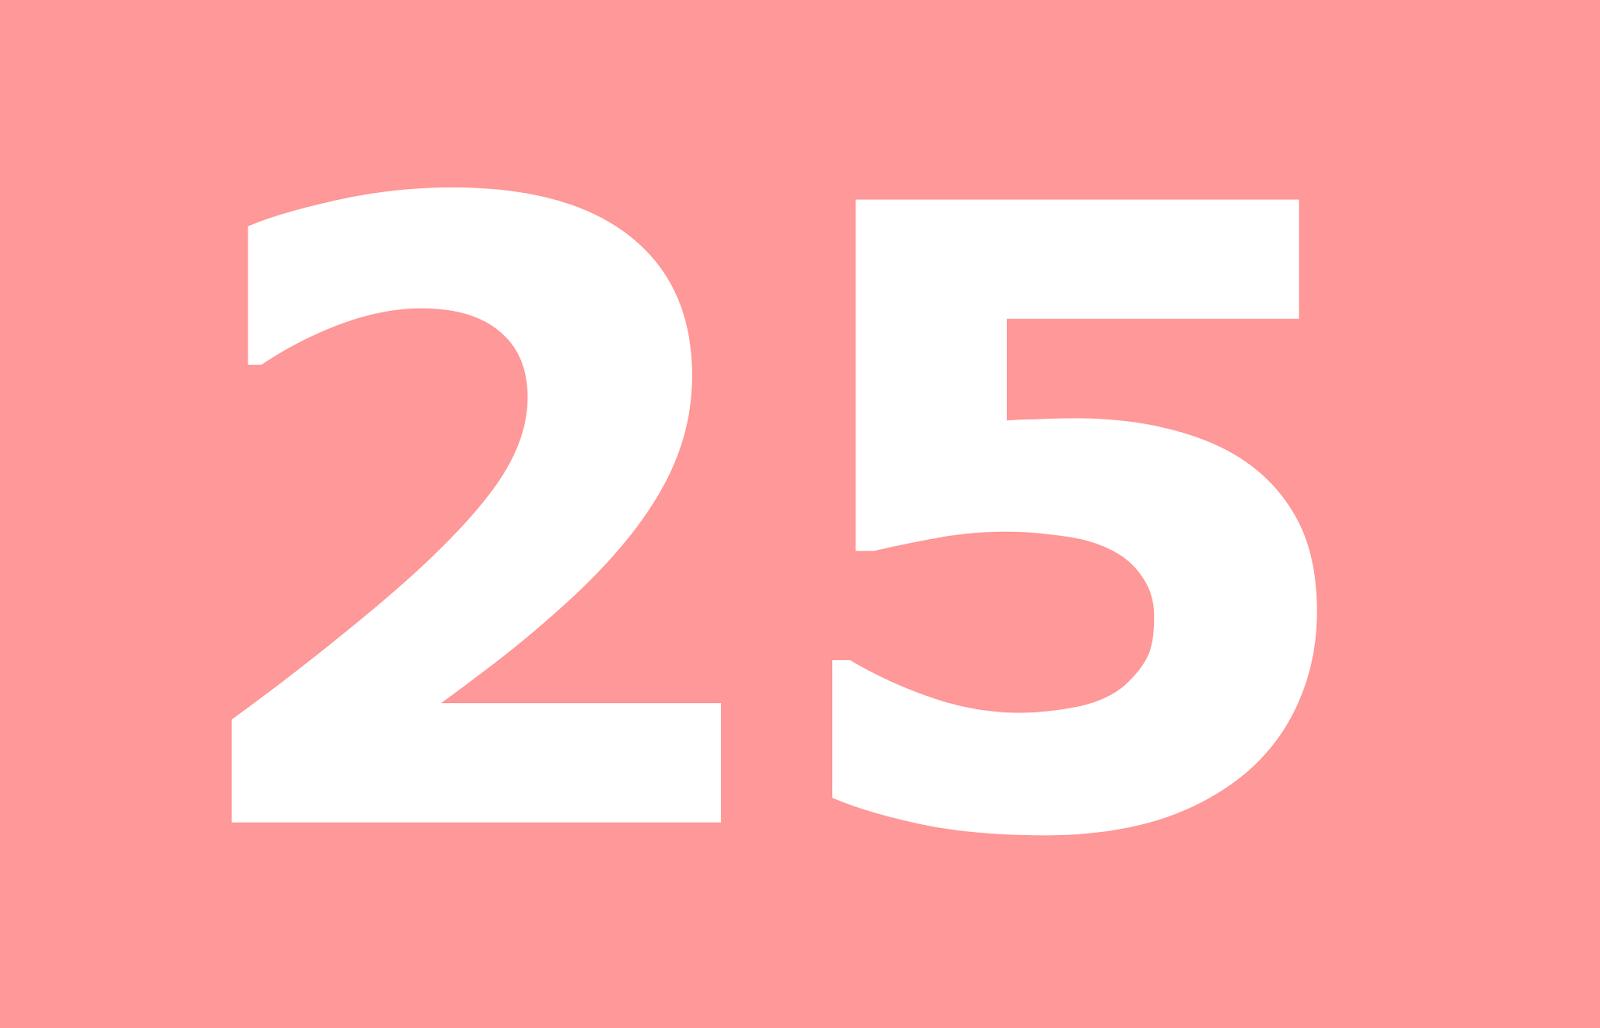 Картинки с числом 25